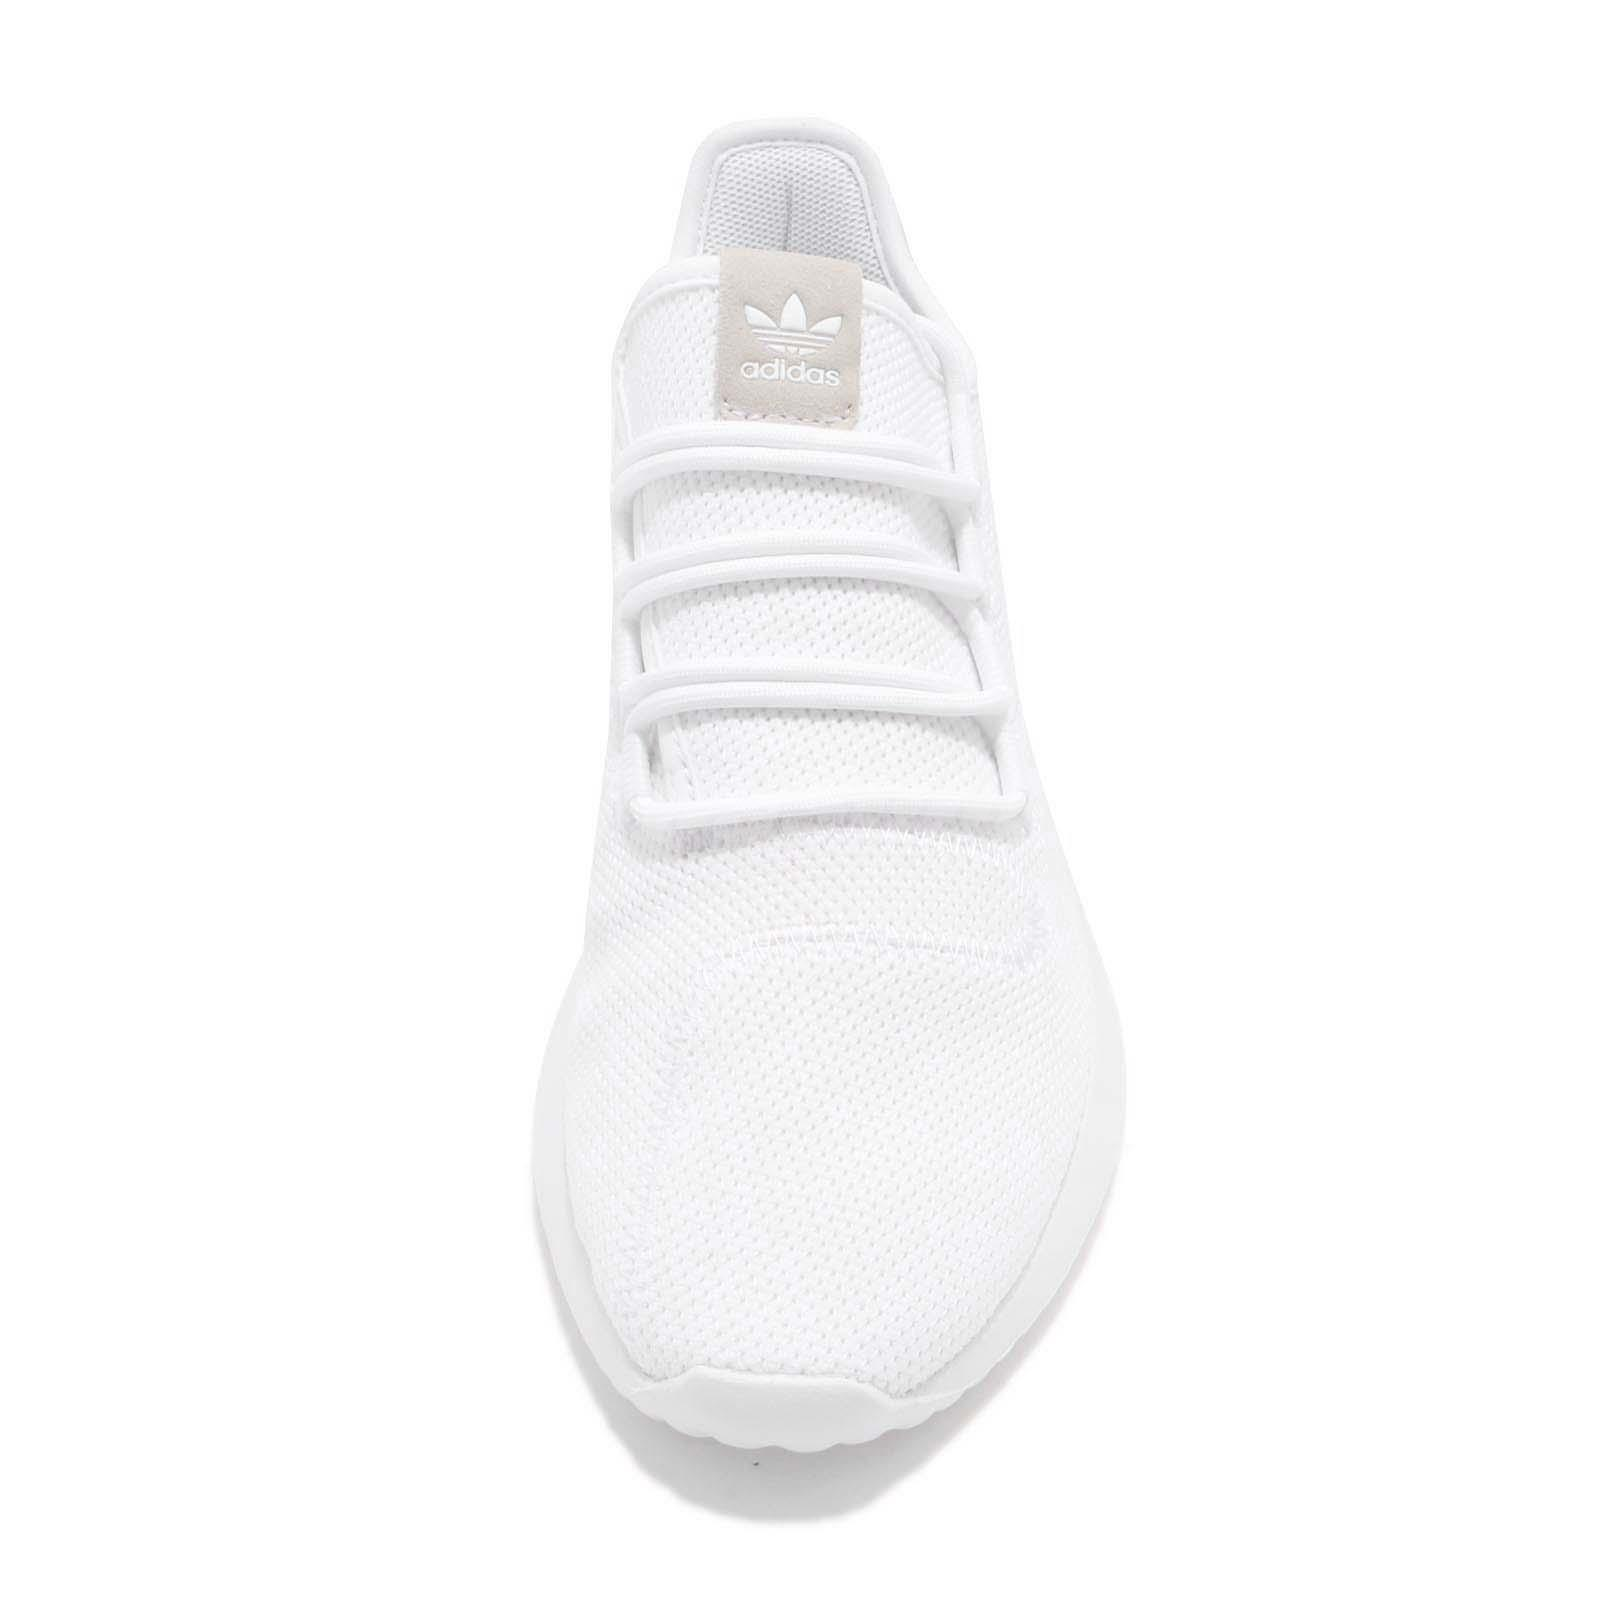 746ee214667077 adidas Originals Tubular Shadow White Men Running Shoes Sneakers ...